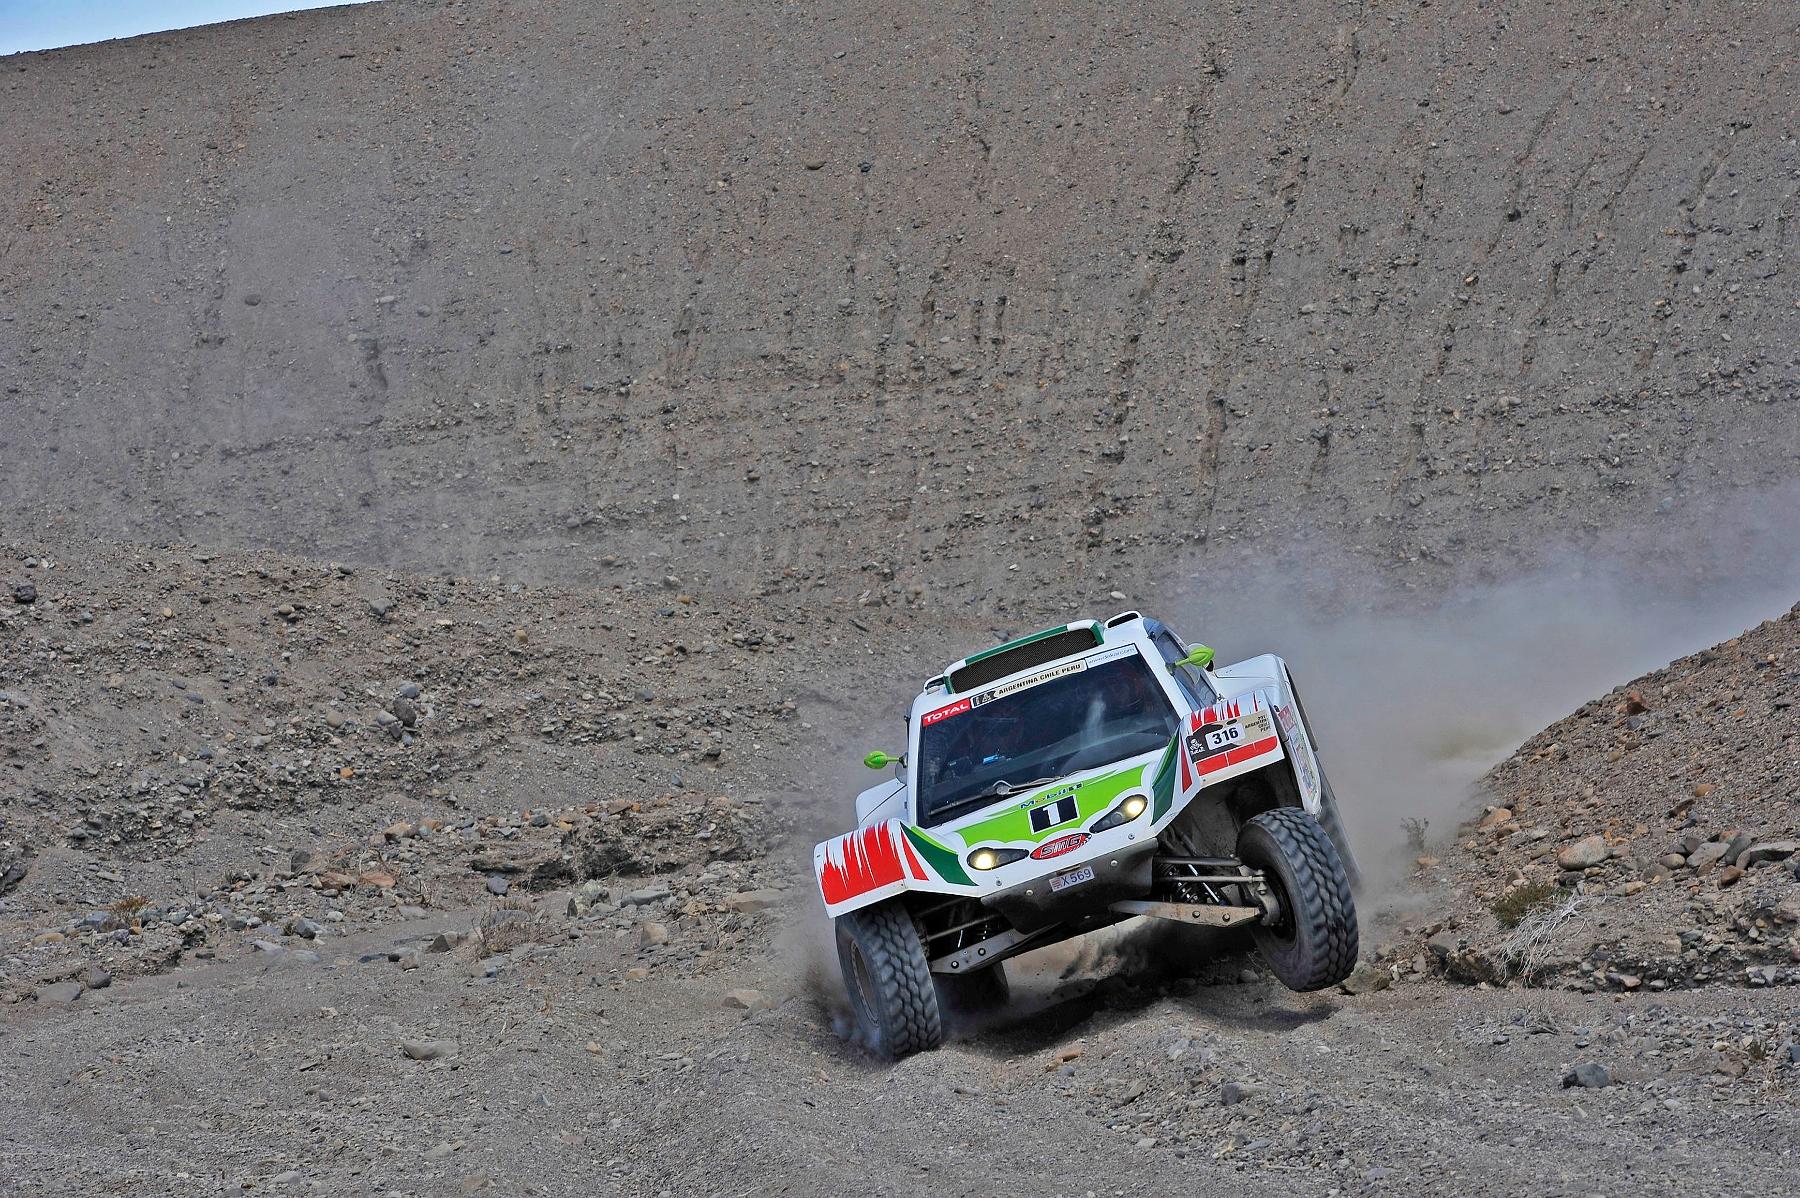 MOTORSPORT - DAKAR ARGENTINA CHILE PERU 2012 - STAGE 8 - COPIAPO (CHI) TO ANTOFAGASTA (CHI) - 09/01/2012 - PHOTO: DPPI